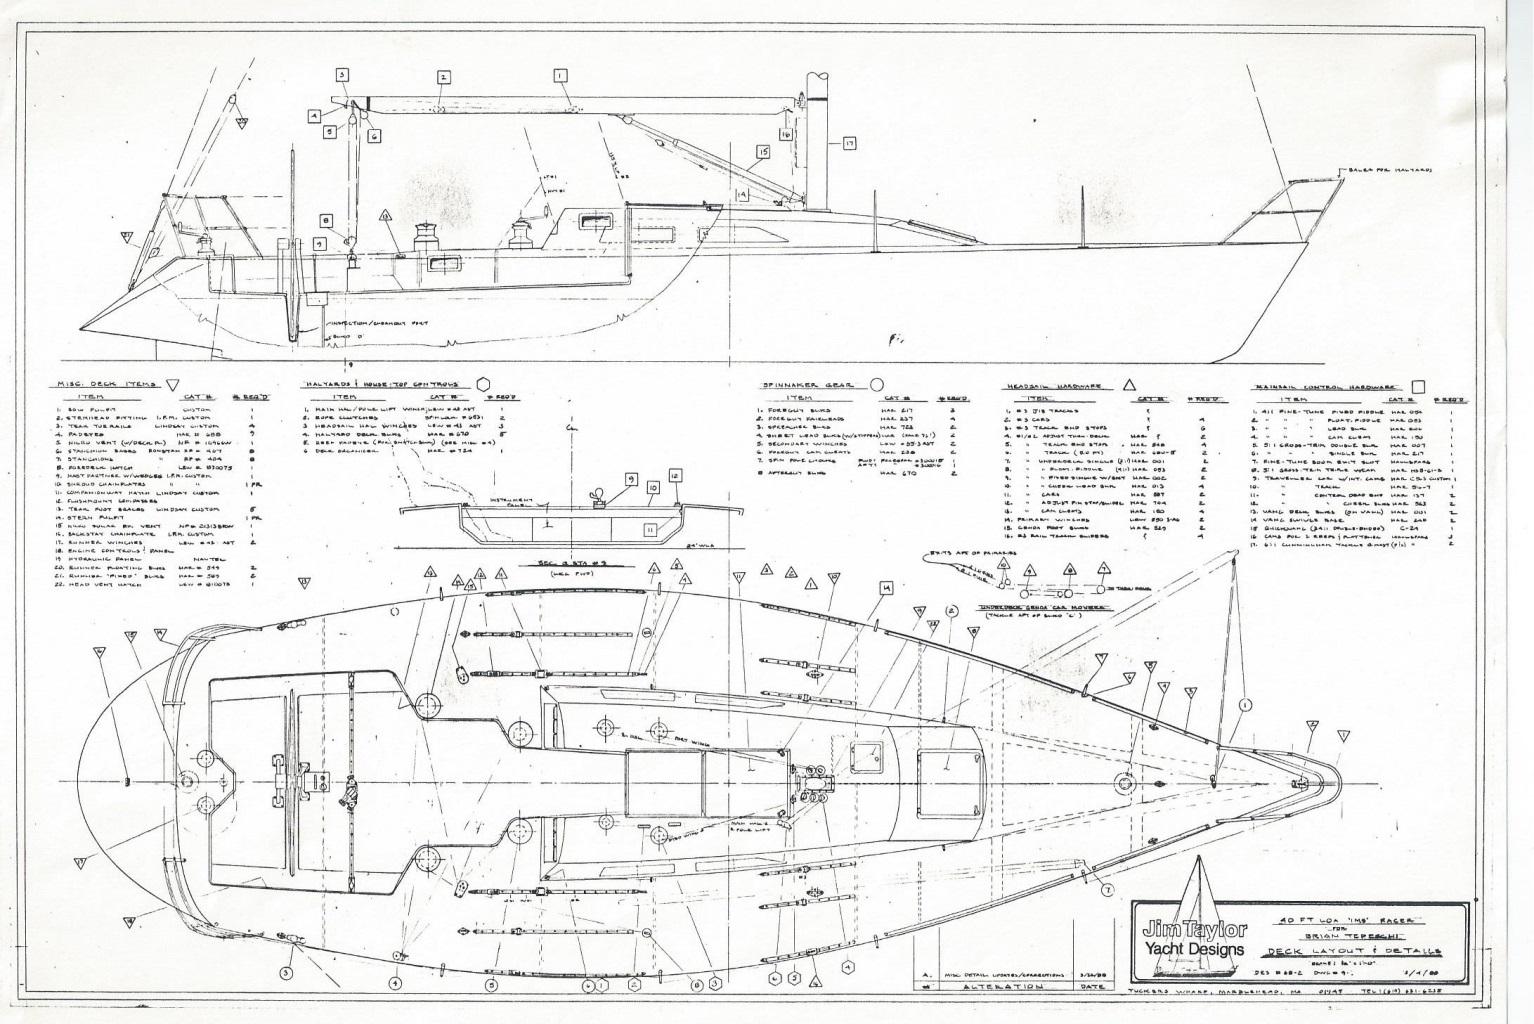 C:\Users\Jim Taylor\Desktop\JTYD\JT_Promo\WebSite\2013\Designs\Racing\68_T40's\T40_Deckplan.jpeg.jpeg